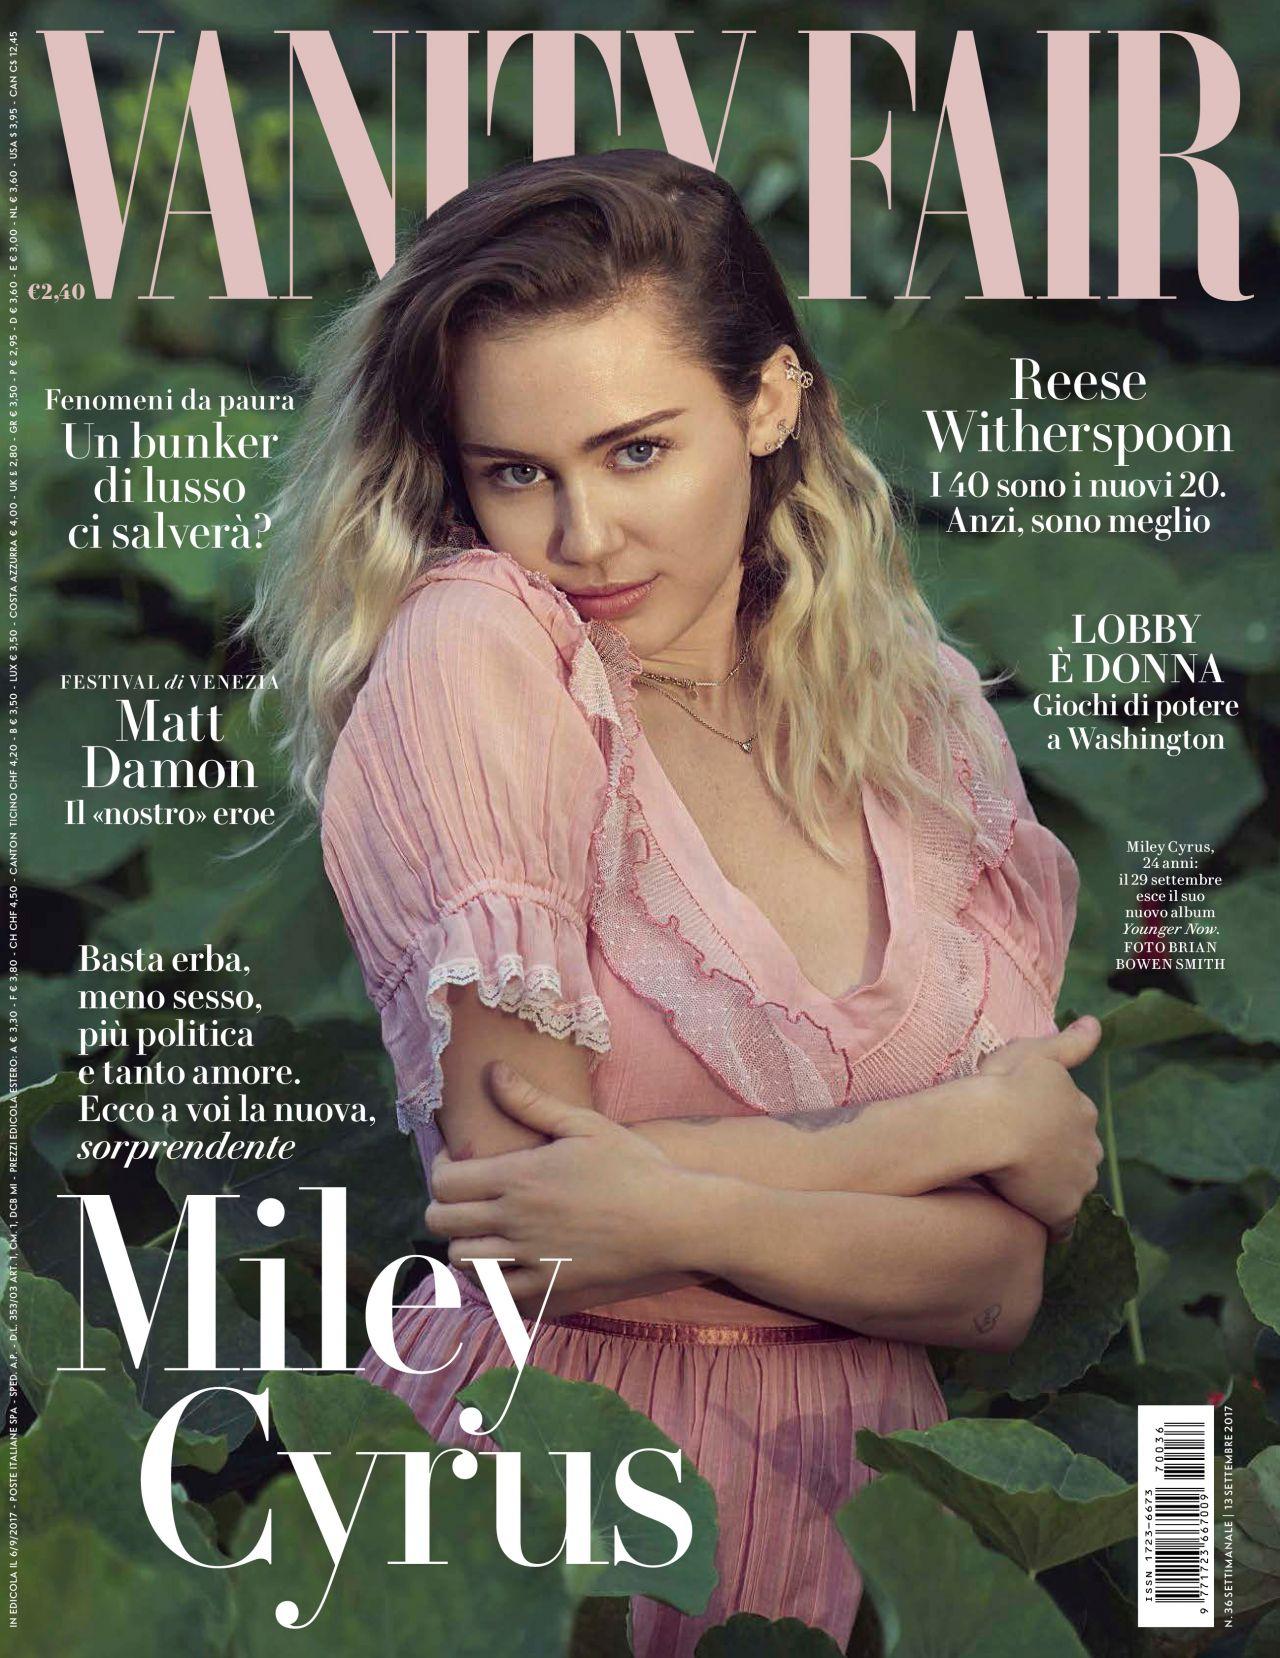 Celebrity News Magazines   Discount Celebrity News ...